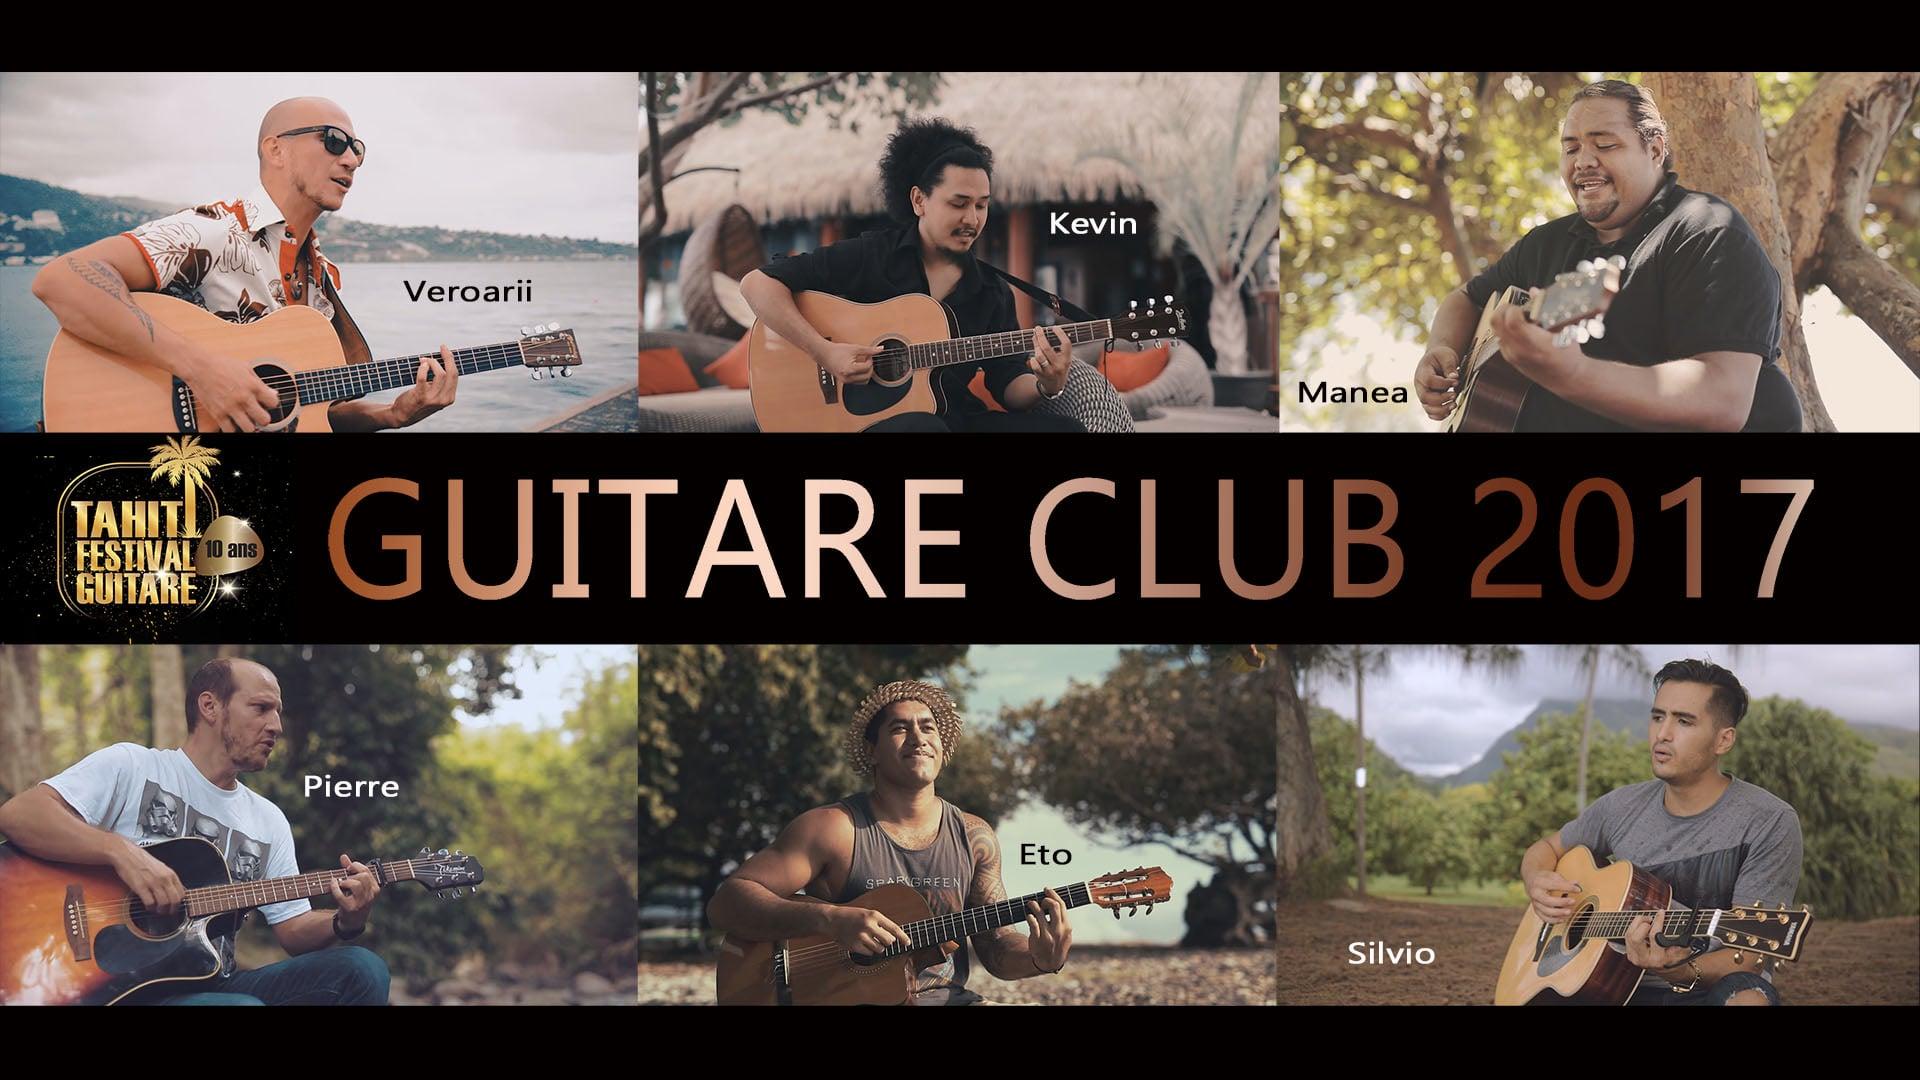 Guitare Club 2017